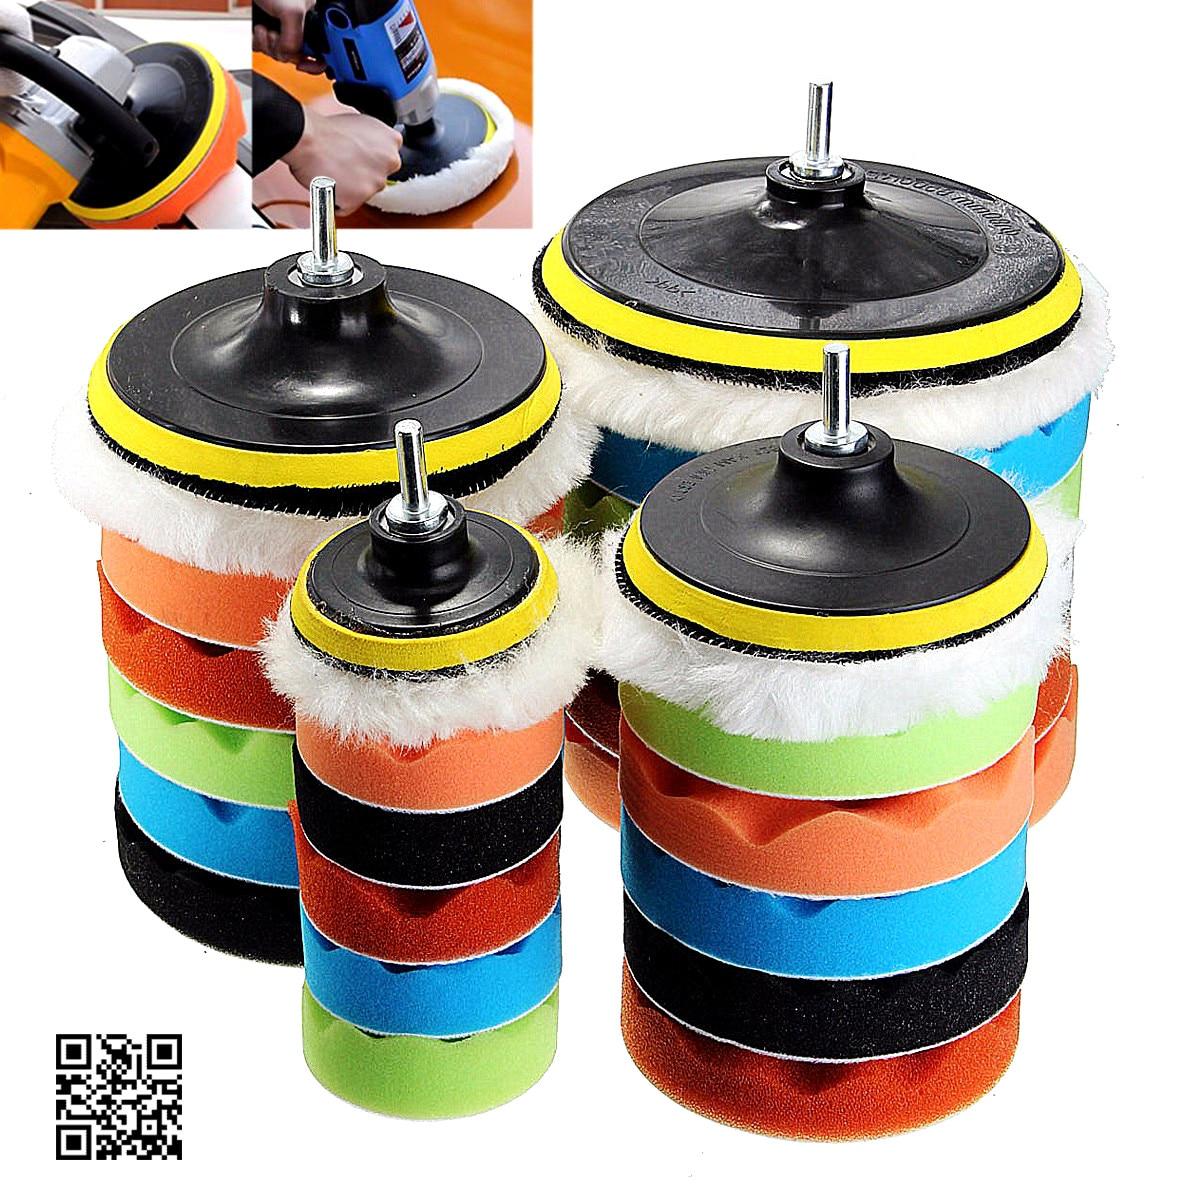 7x 3''5''6''7''Buffing Sponge Polishing Pad Hand Tool Kit For Car Polisher Compound Polishing